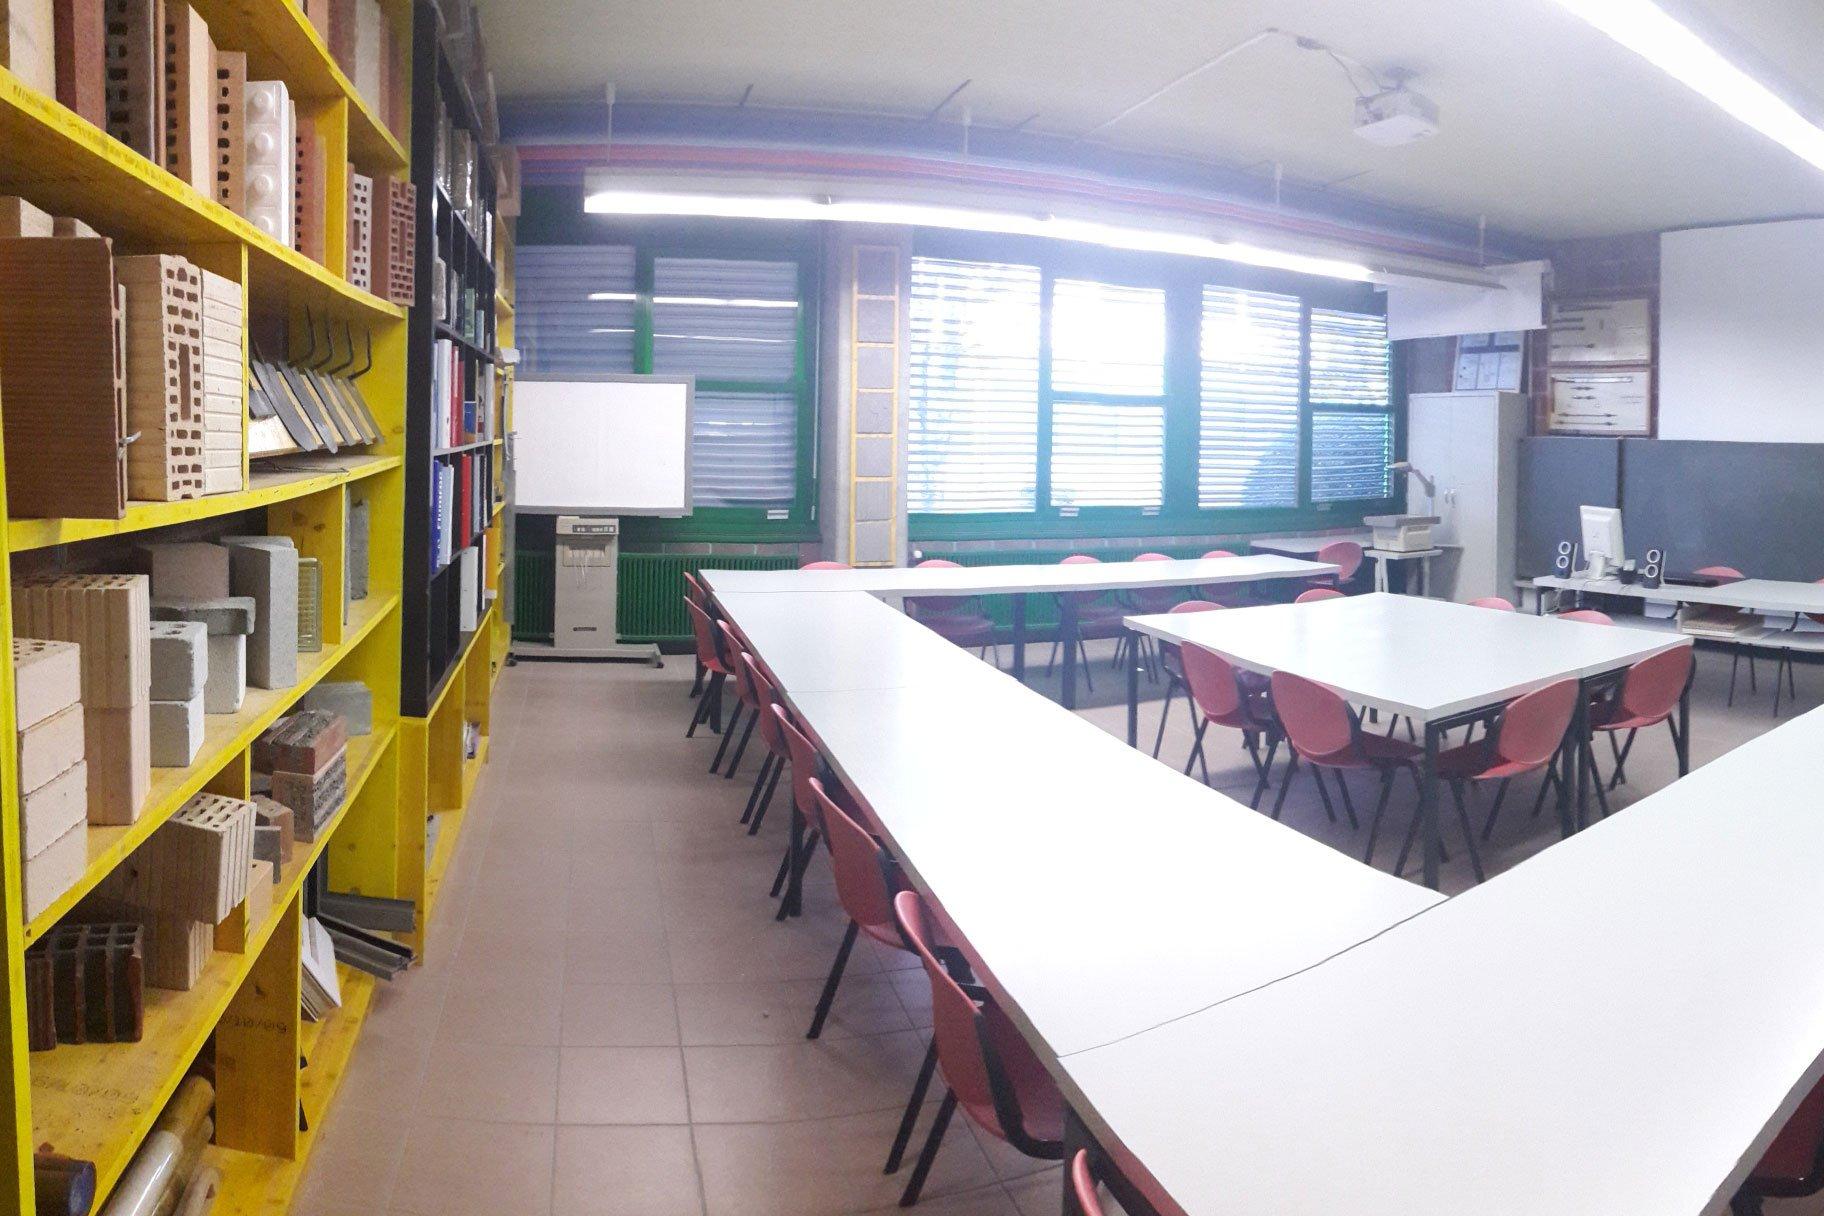 ssic-cfp-gordola-infrastrutture-aula-04